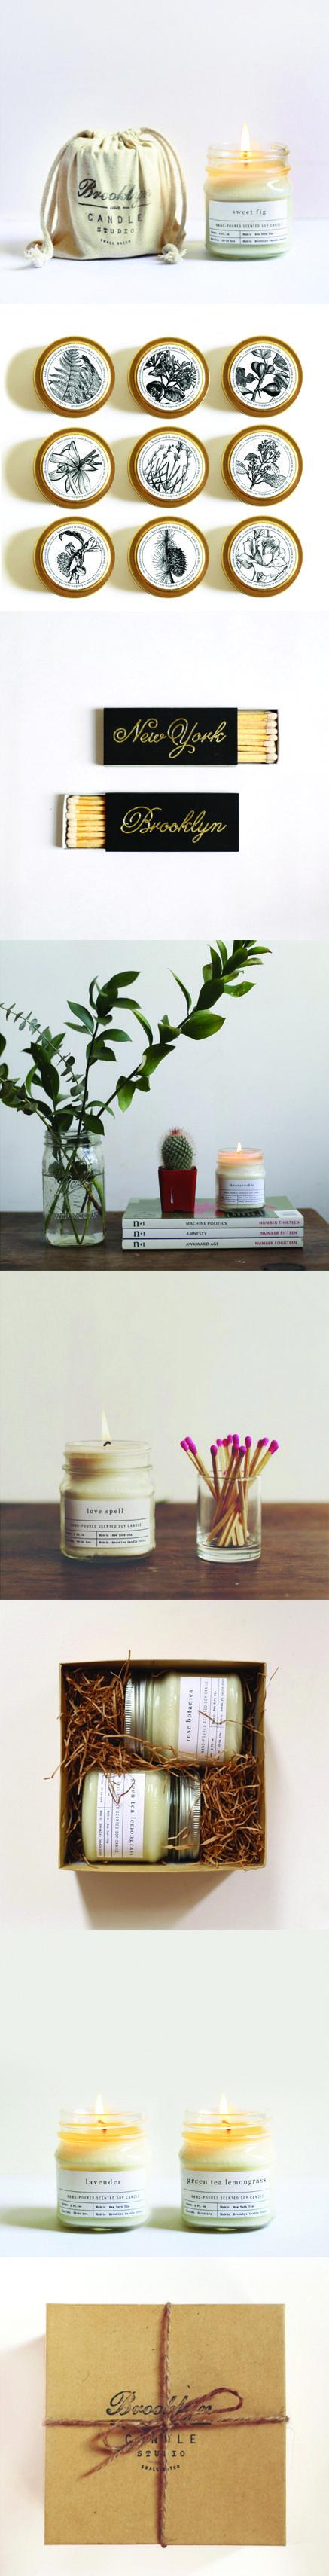 Brooklyn Candle Studio Packaging